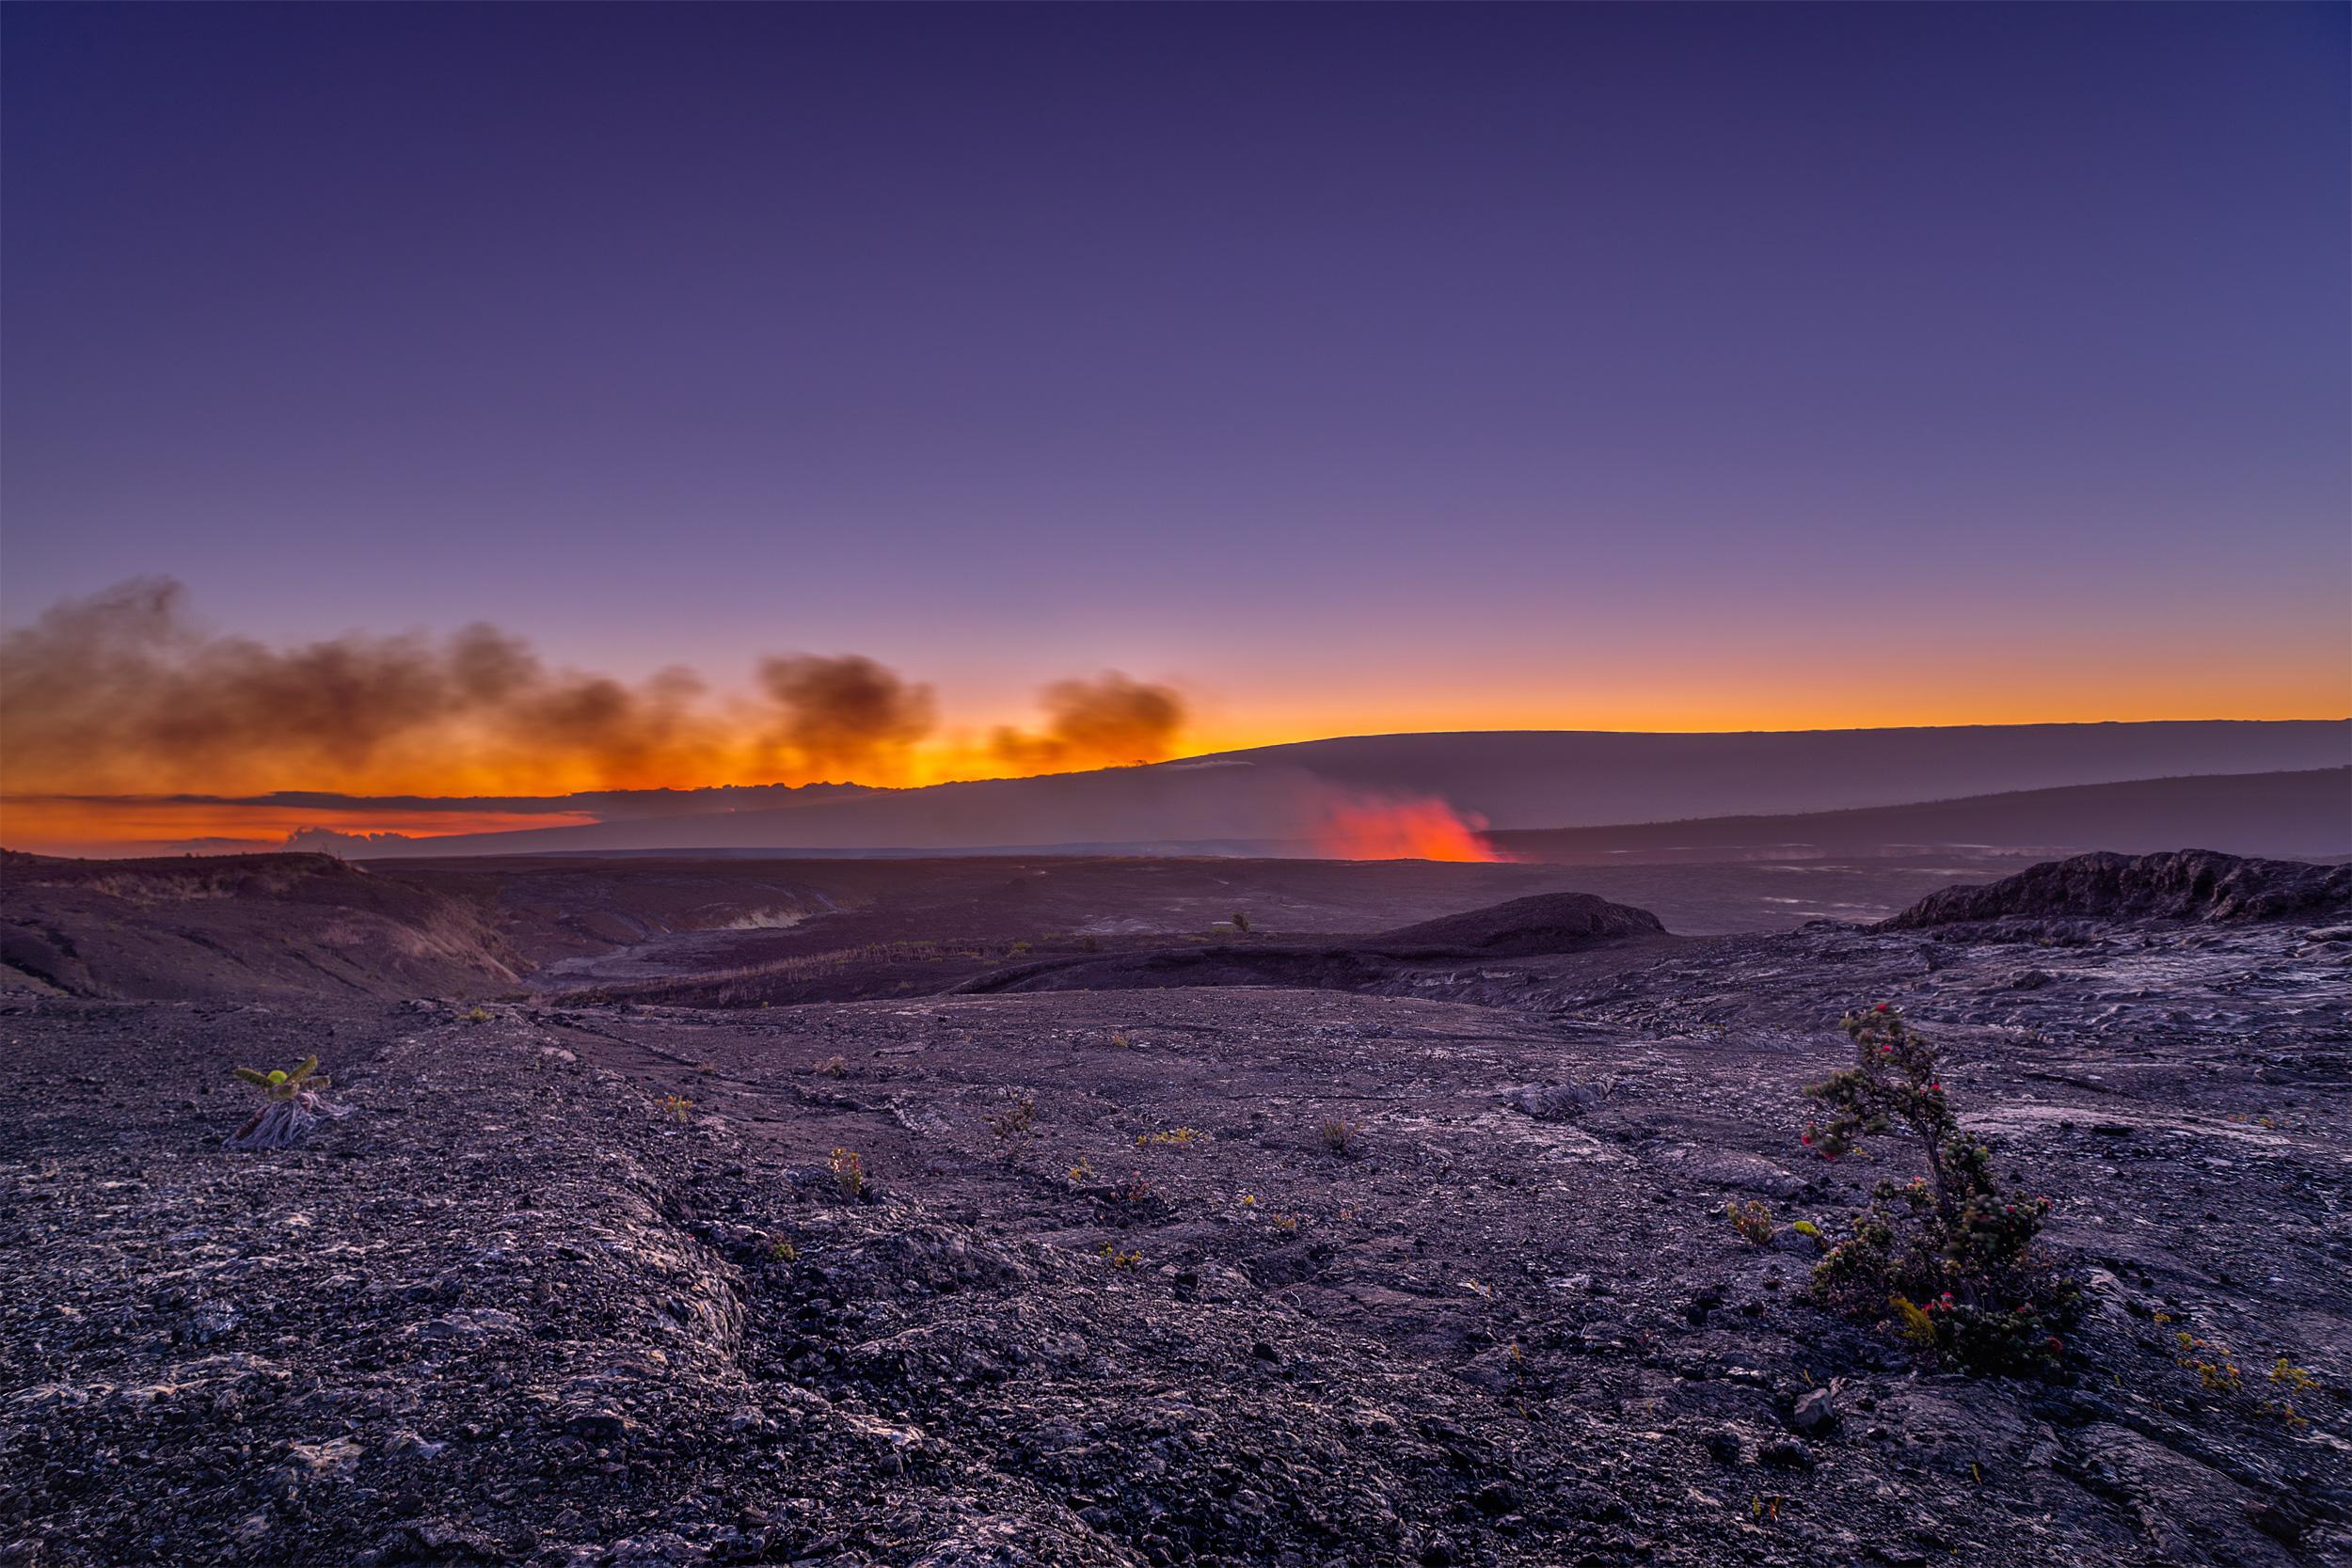 Kilauea Caldera - Hawaii Volcano National Park -Halema'uma'u Crater in the Kilauea Calderon at Hawai'i Volcanoes National Park.Taken on the Keanakākoʻi Trail, overlooking Mauna Loa